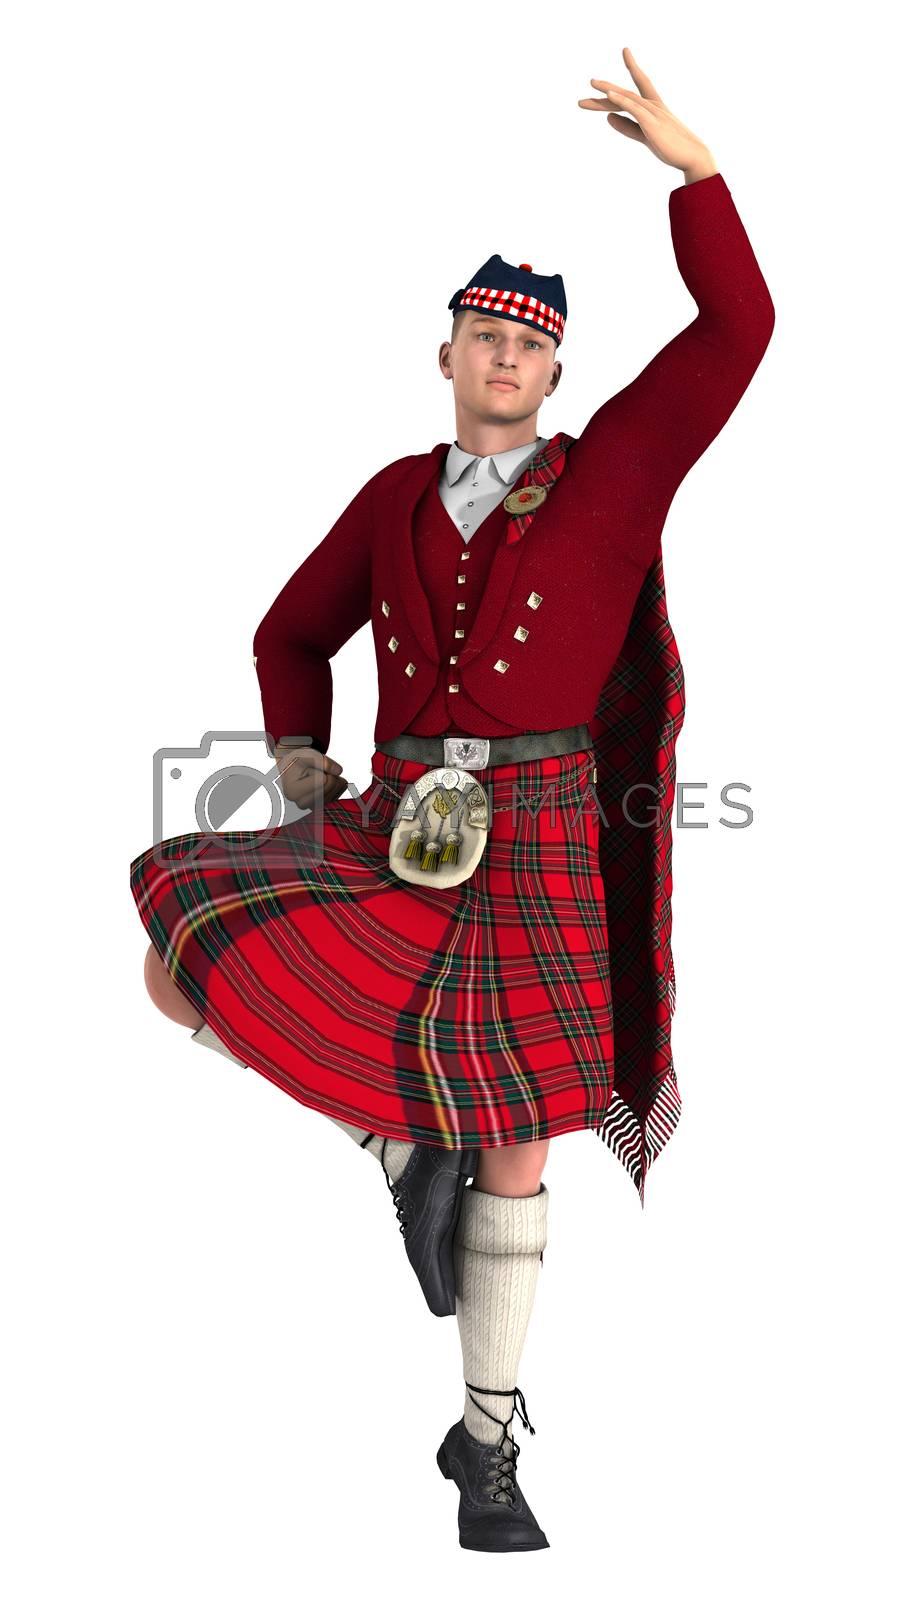 3D digital render of a highlander dancing isolated on white background